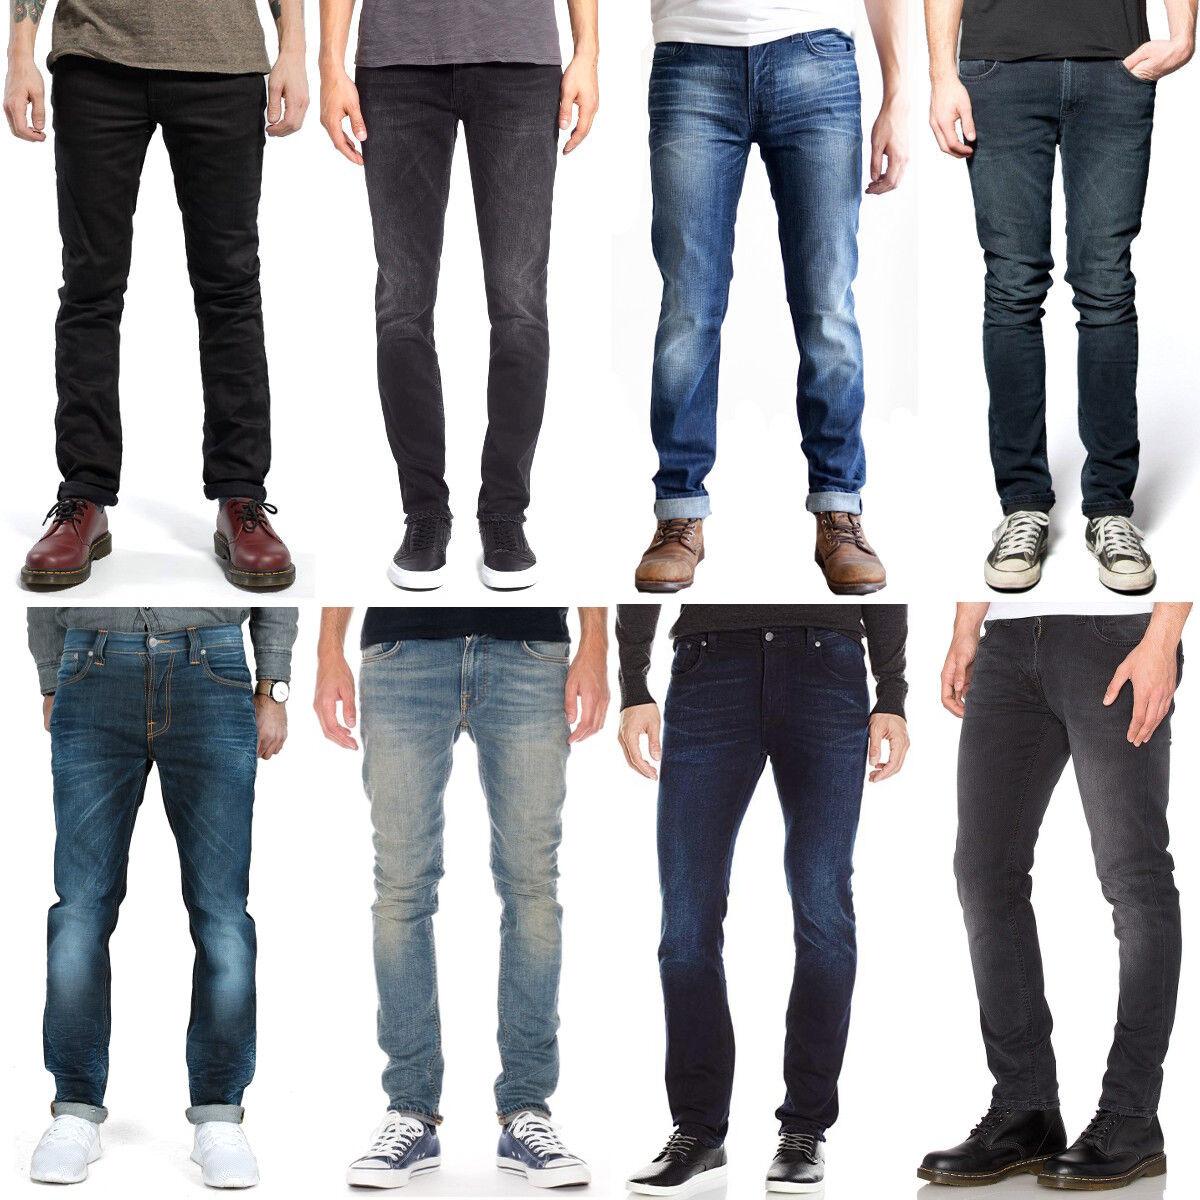 Nudie UOMO SLIM FIT JEANS-Pantaloni   Thin Finn   sale   Blu, Nero   Stretch